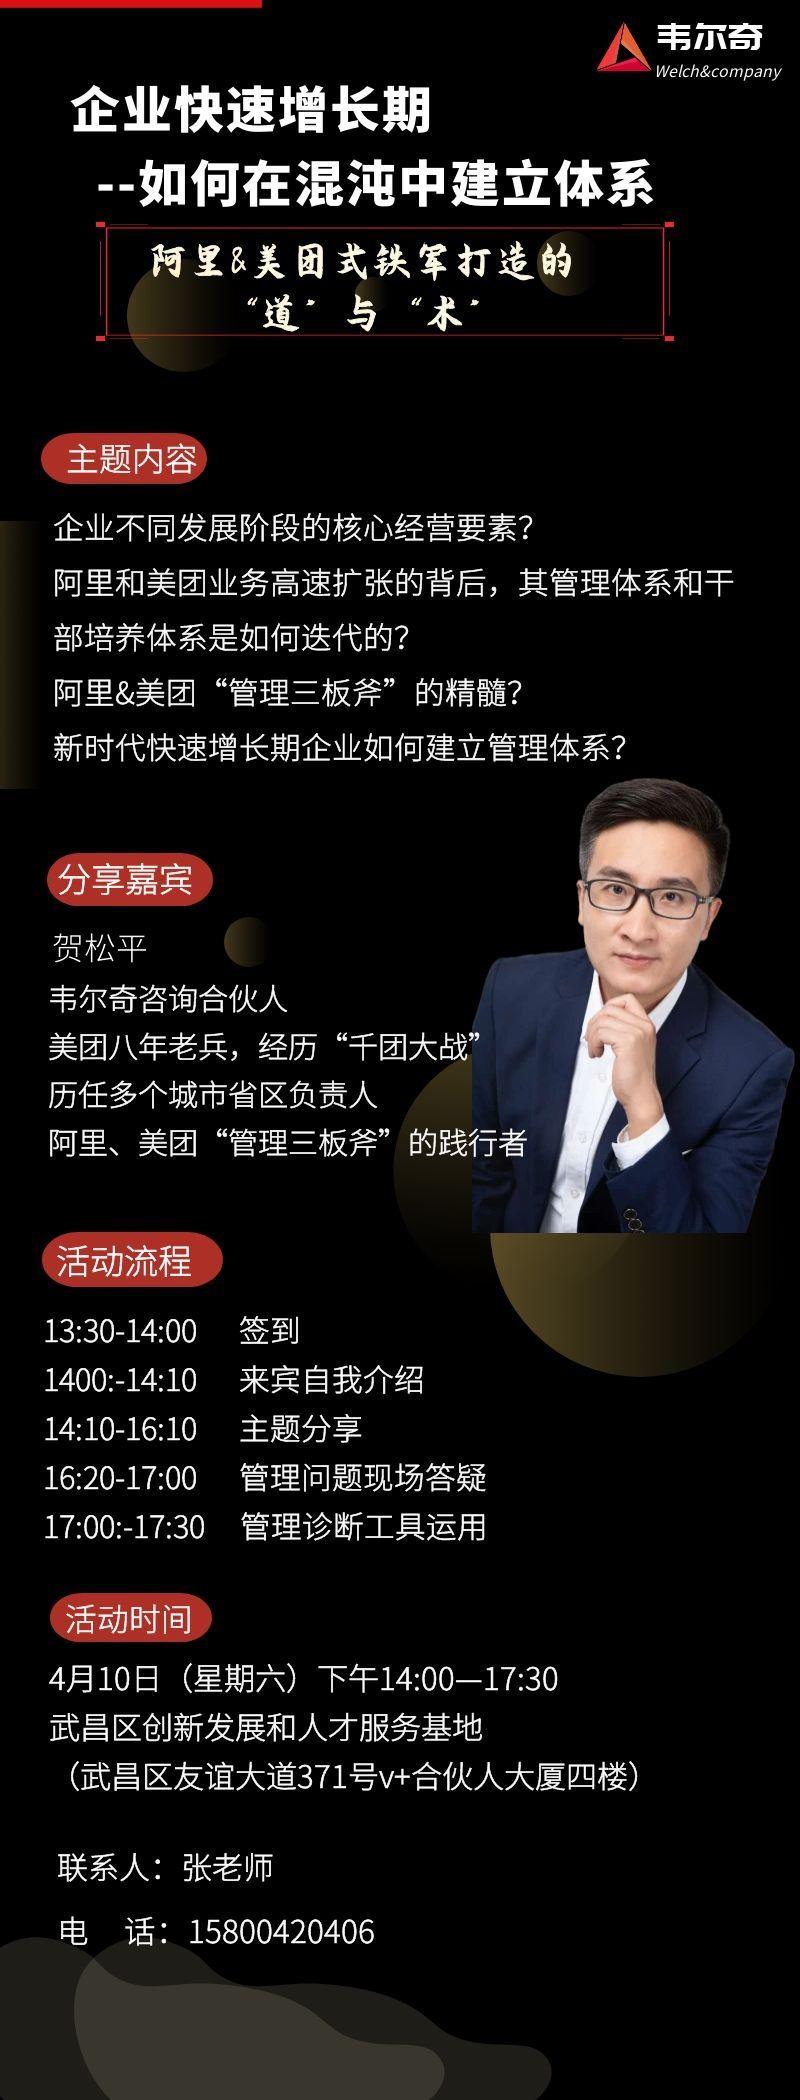 http://www.huodongxing.com/file/20210321/7284097891603/964109427635617.jpg